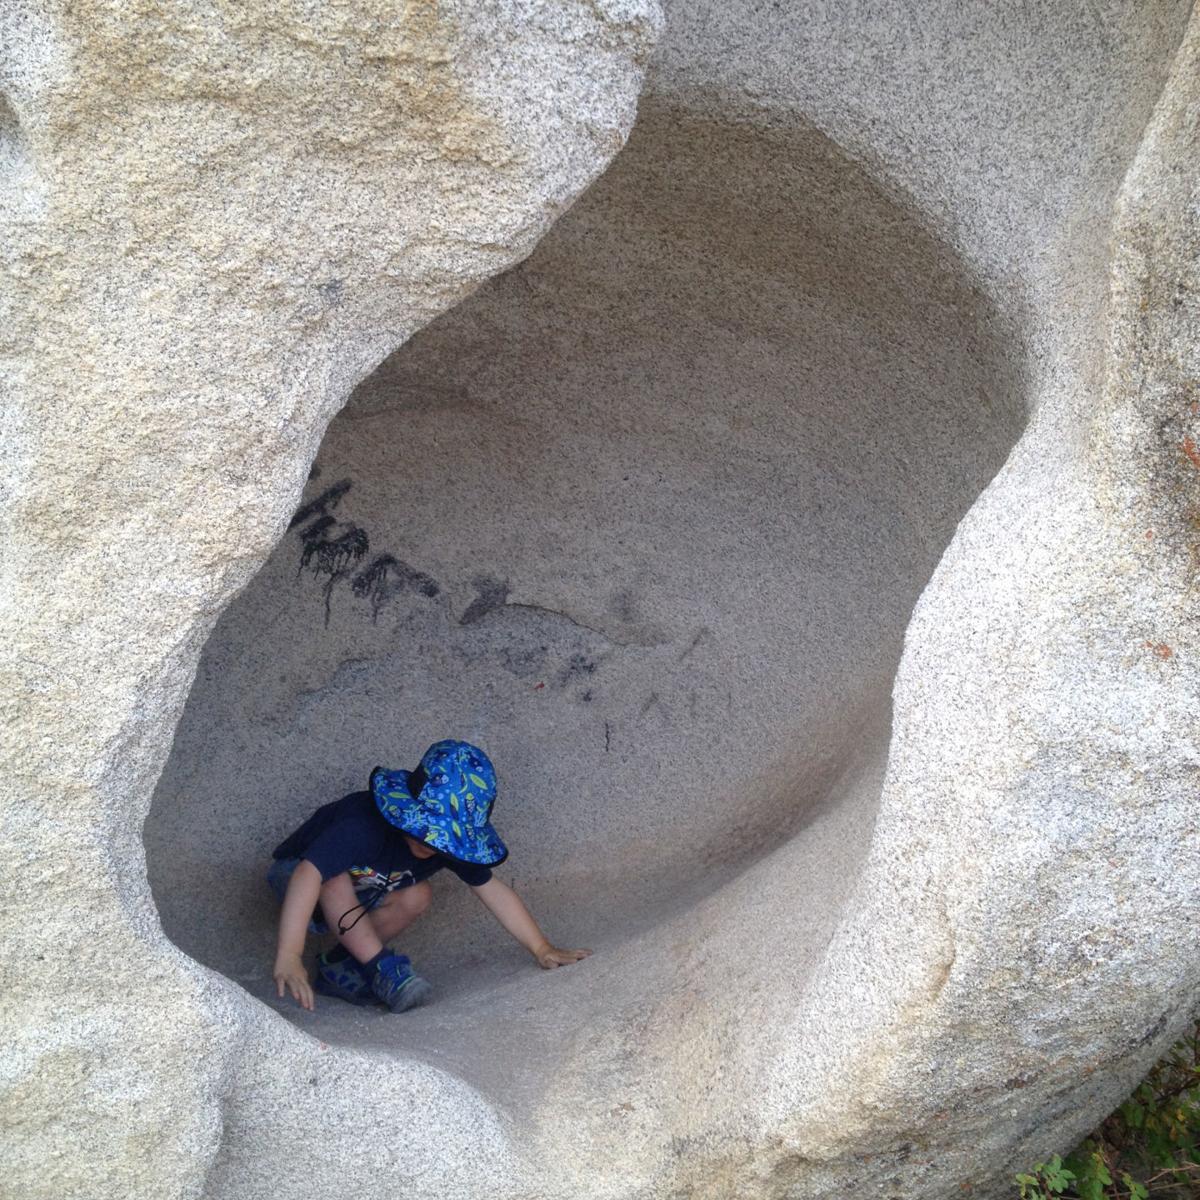 Raising an outdoor kid